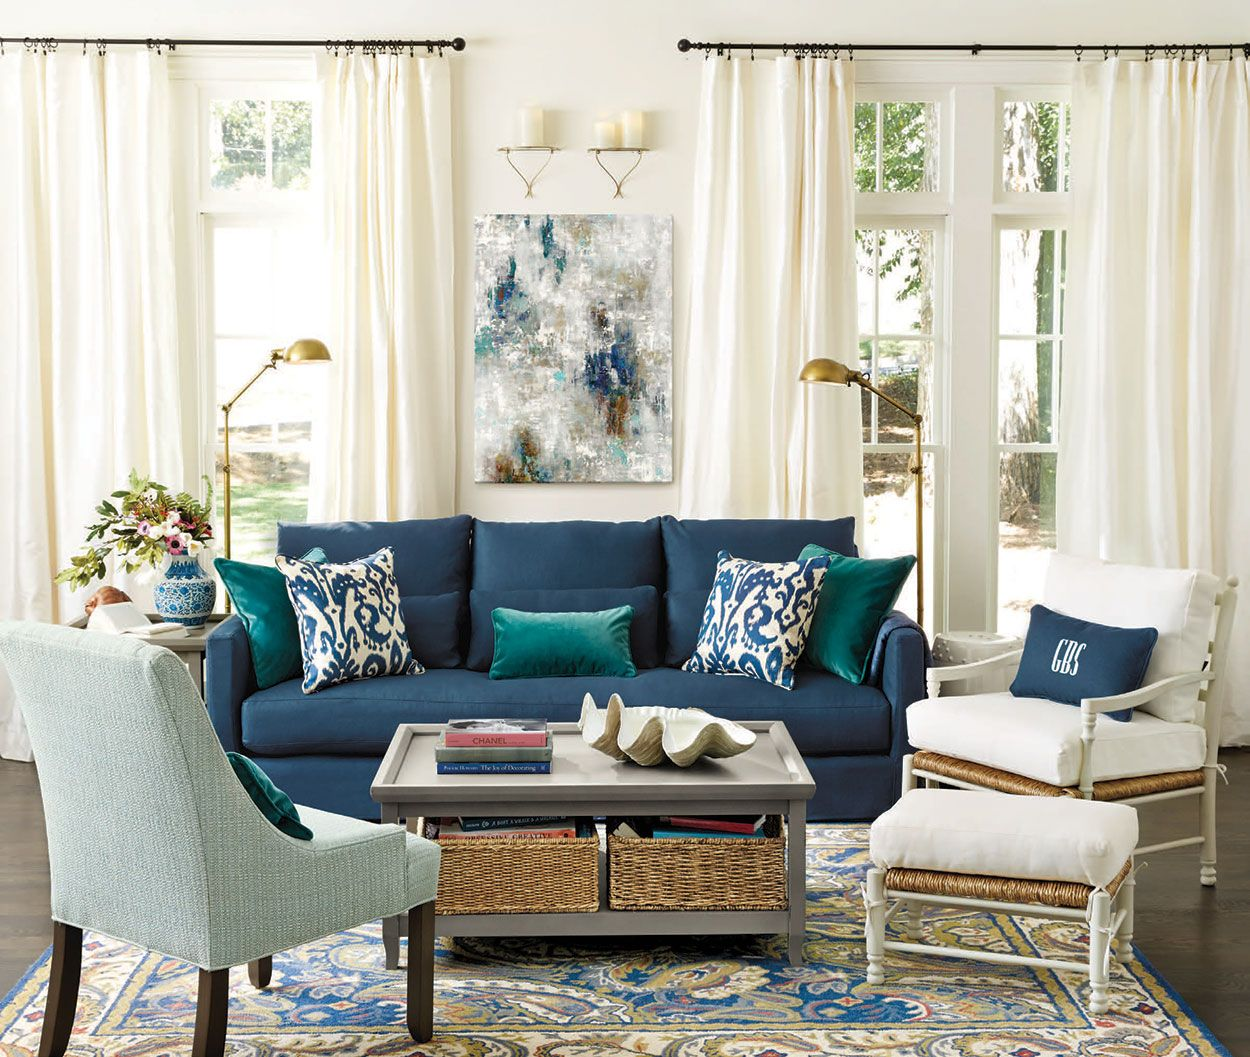 Living Room Ideas With Blue Couch Novocom Top